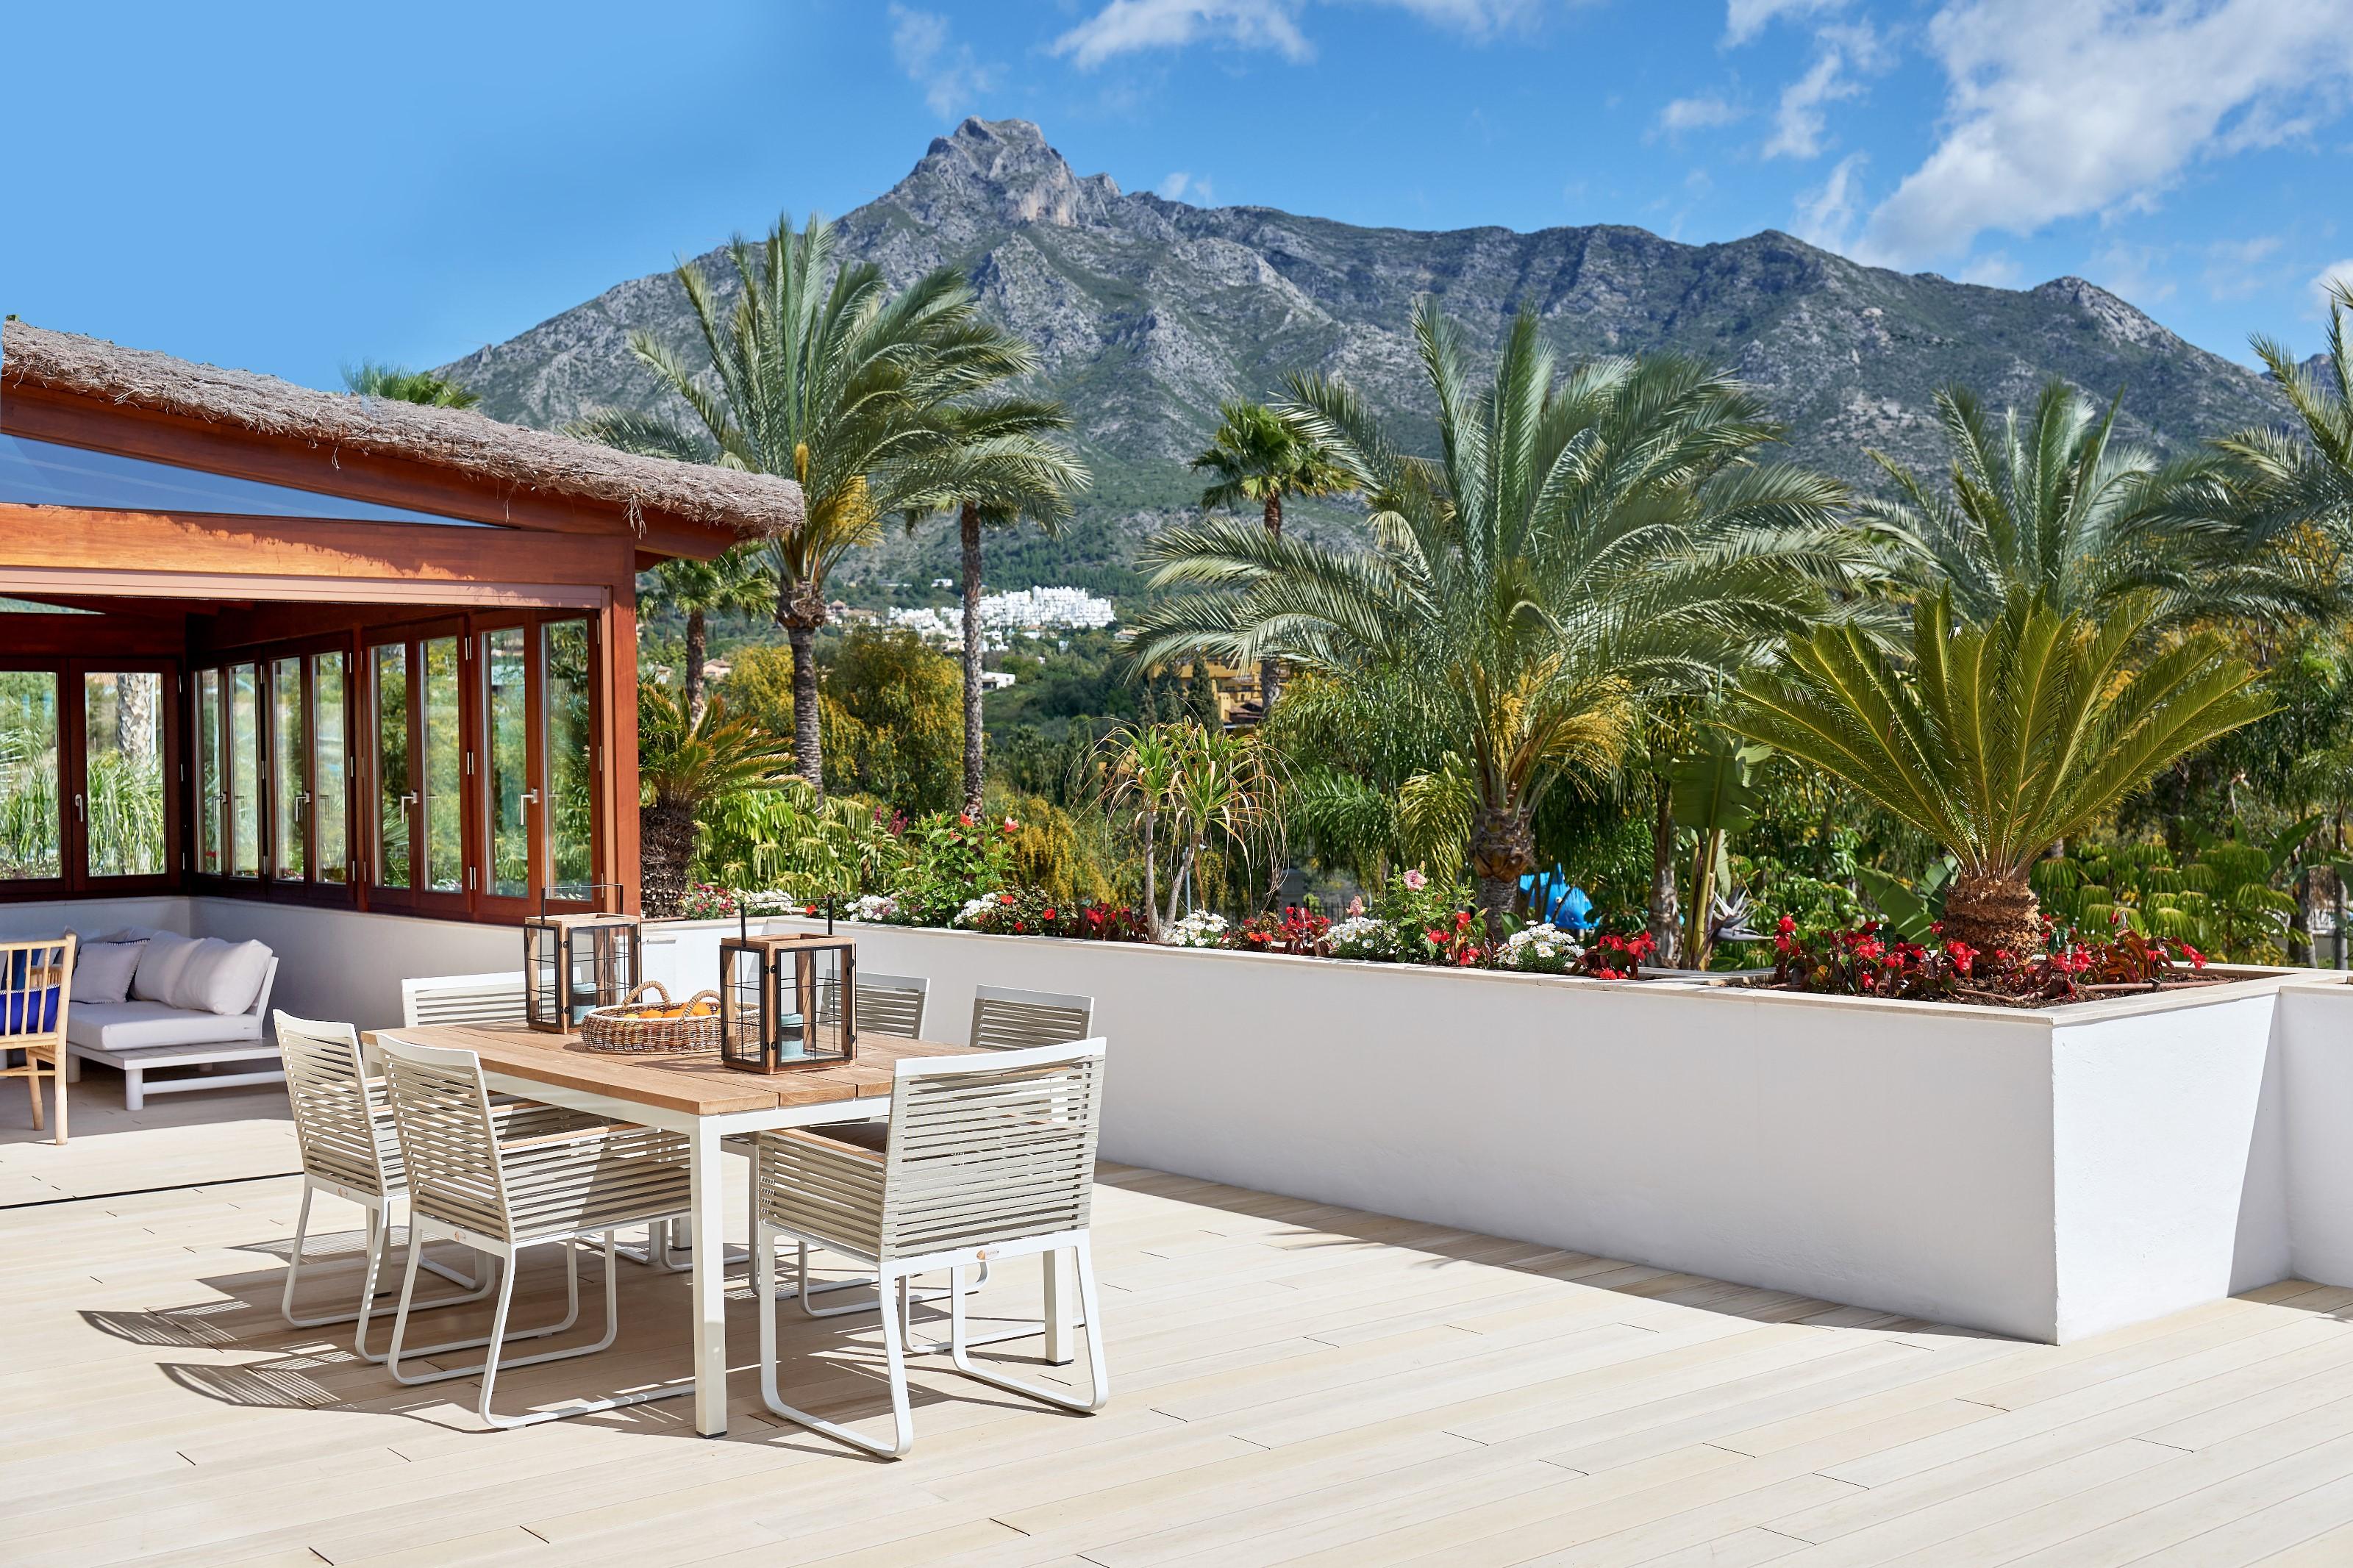 Las Lomas del Marbella Club, a private oasis in Marbella